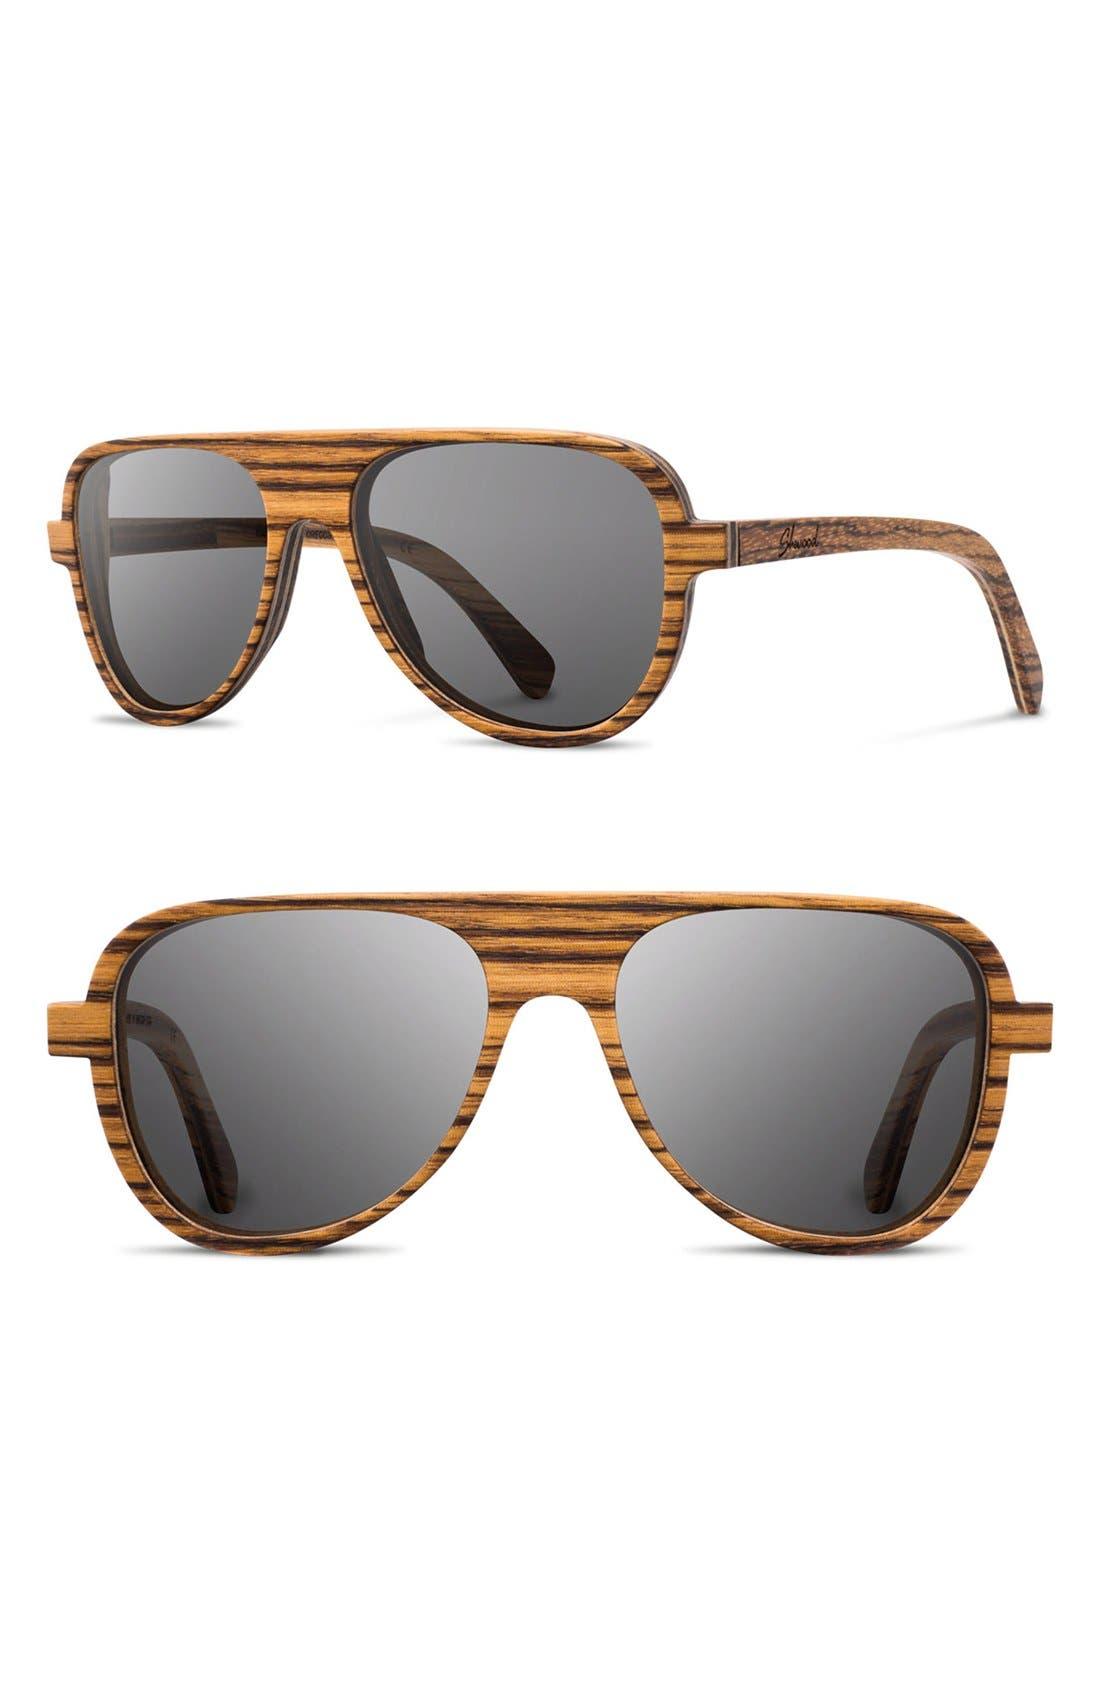 shwood medford 56mm wood sunglasses nordstrom